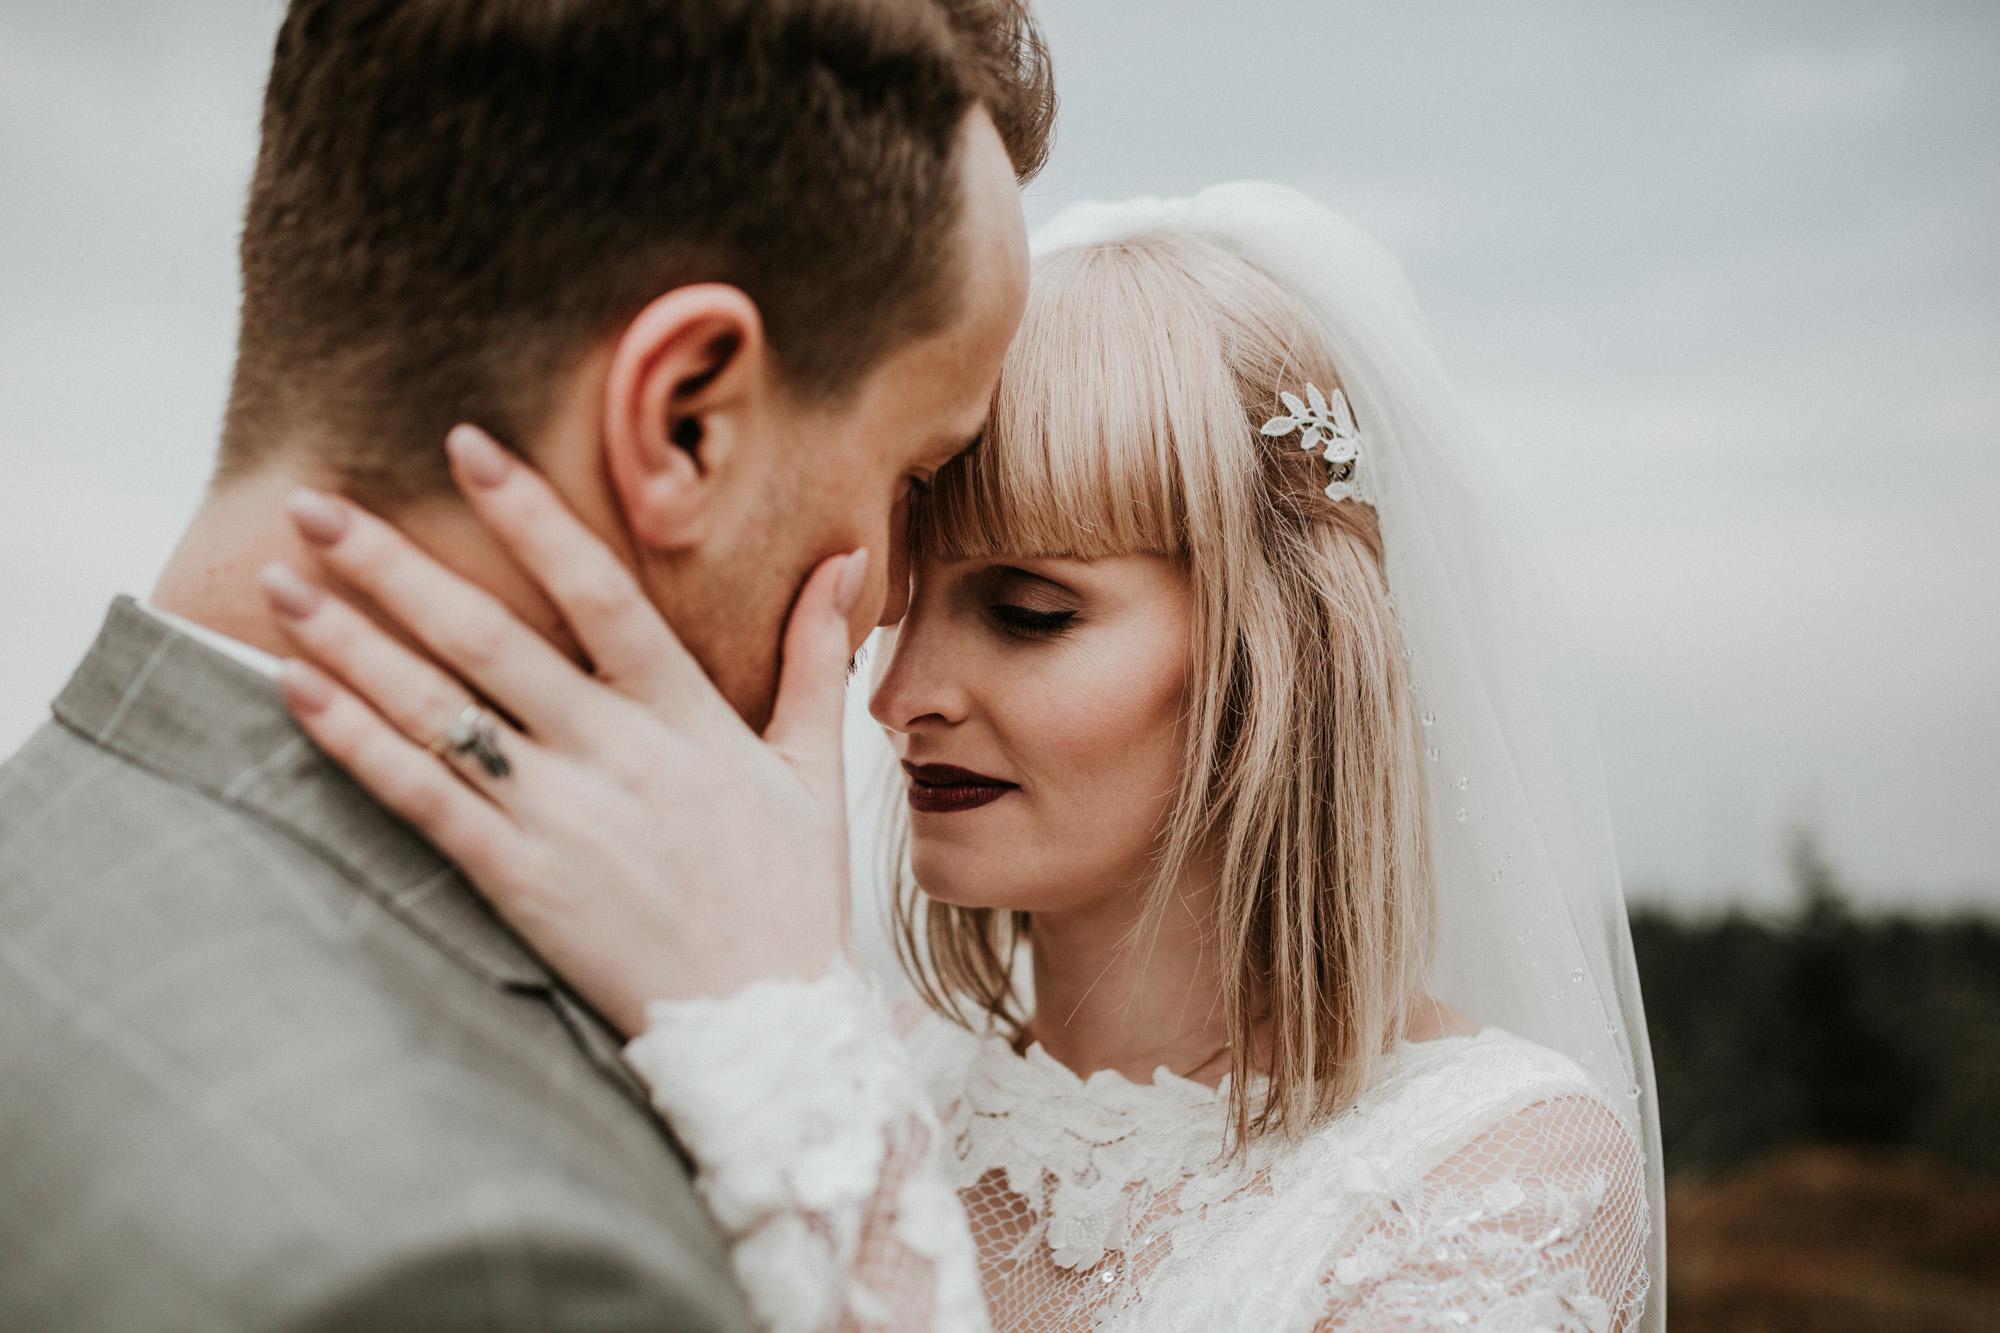 DanielaMarquardtPhotography_Hochzeitsfotograf_Düsseldorf_Köln_Mallorca_Bayern_Austria_Harz_LinaundMaik_Afterwedding-Shooting_Weddingphotographer_Ibiza_Tuskany_Italien_Toskana81